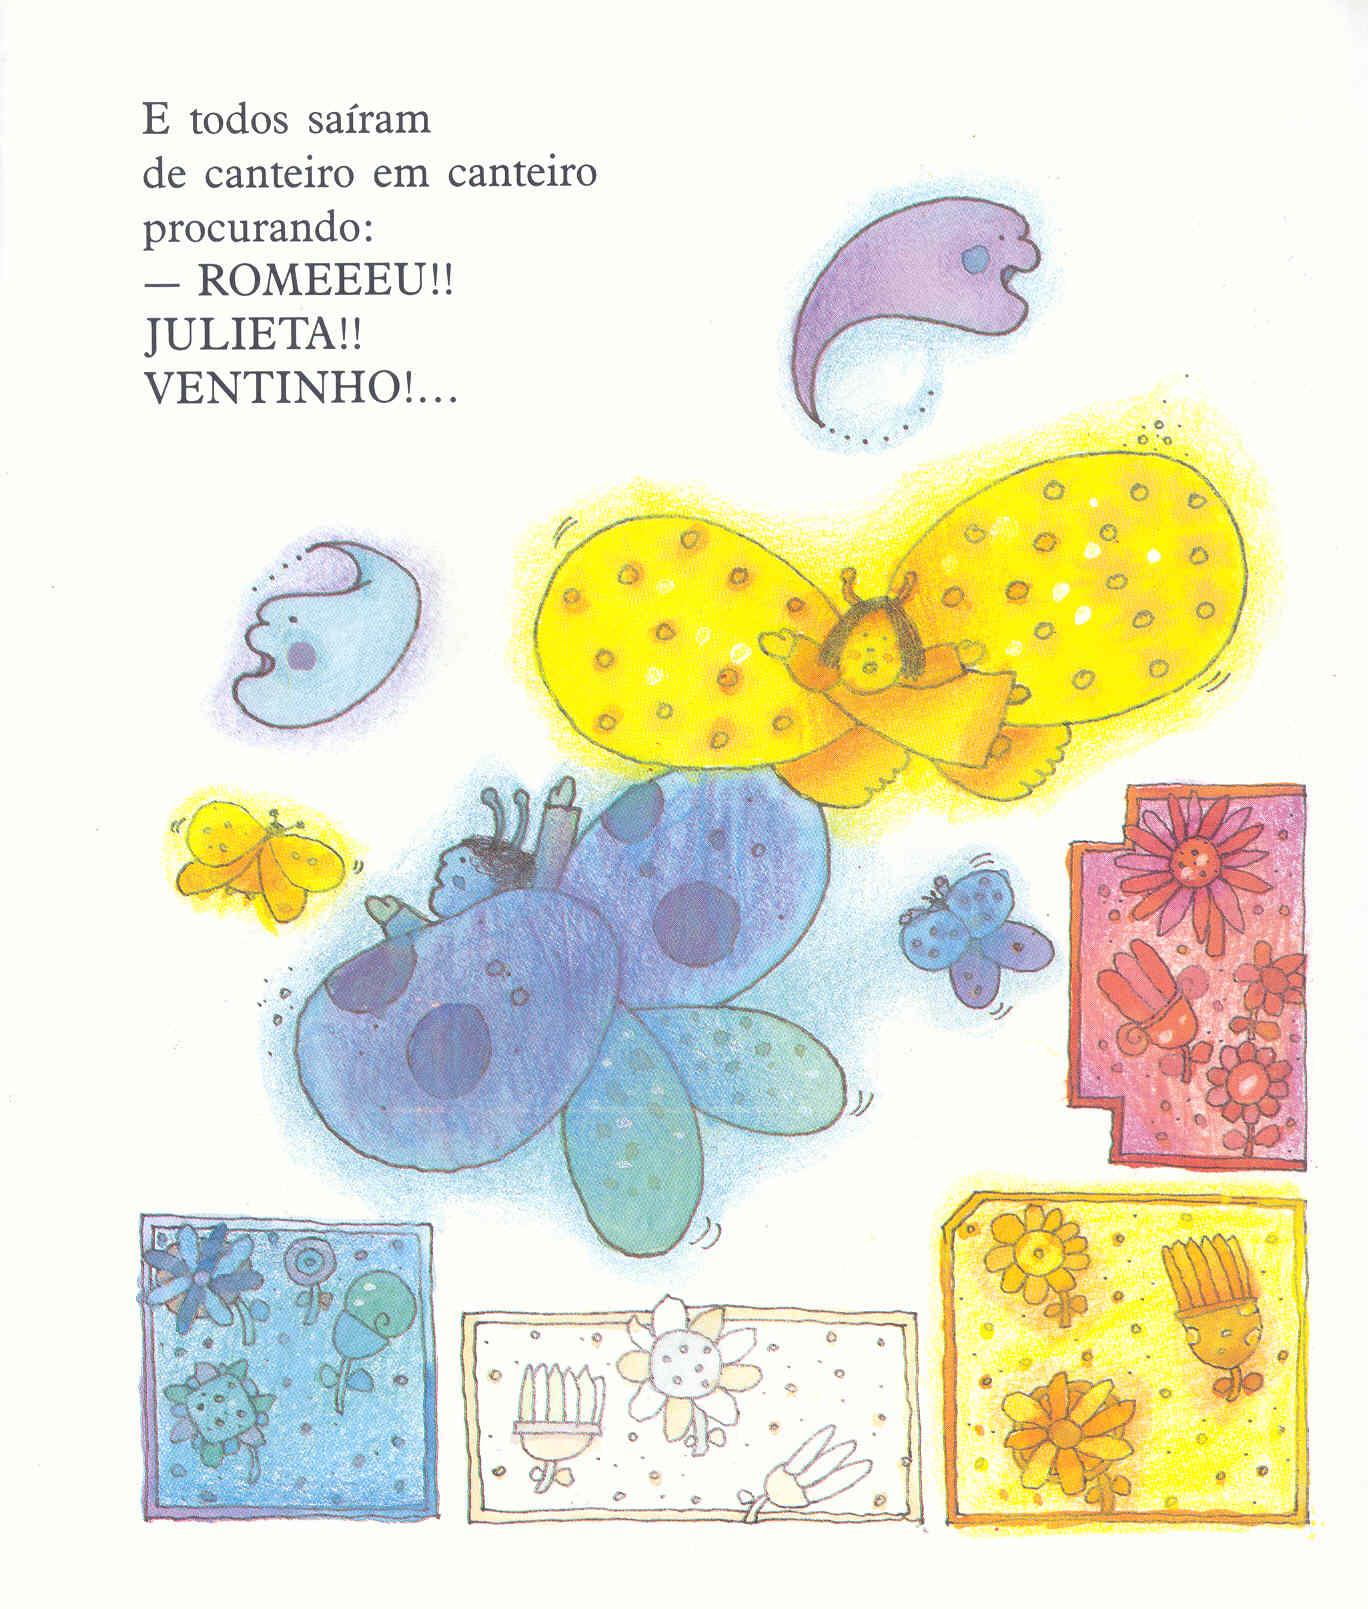 Livro Romeu e Julieta-33